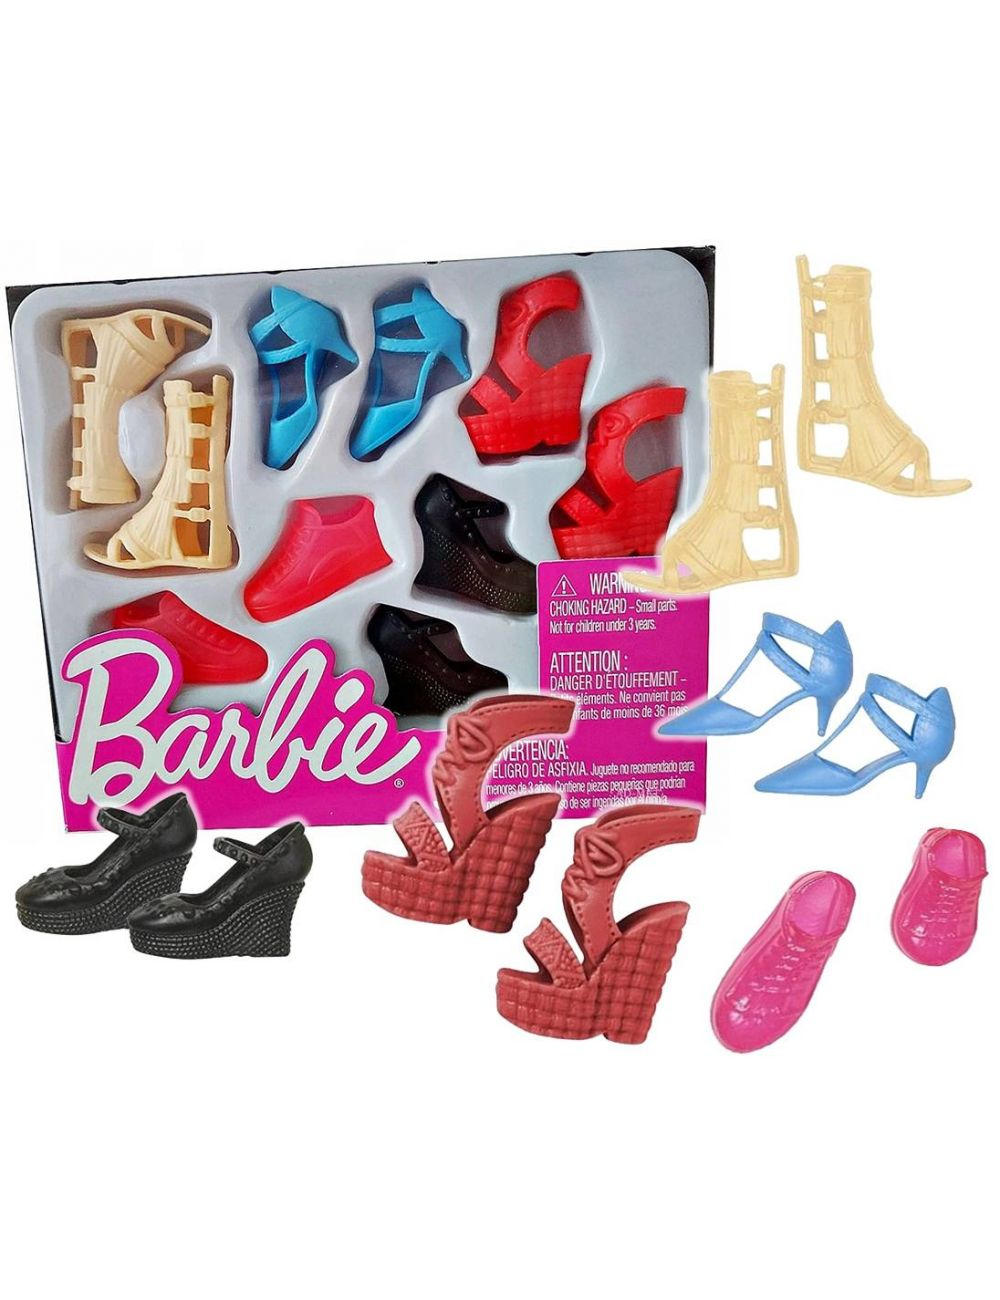 Barbie Modne Buty dla Lalki Zestaw 5 par FCR93